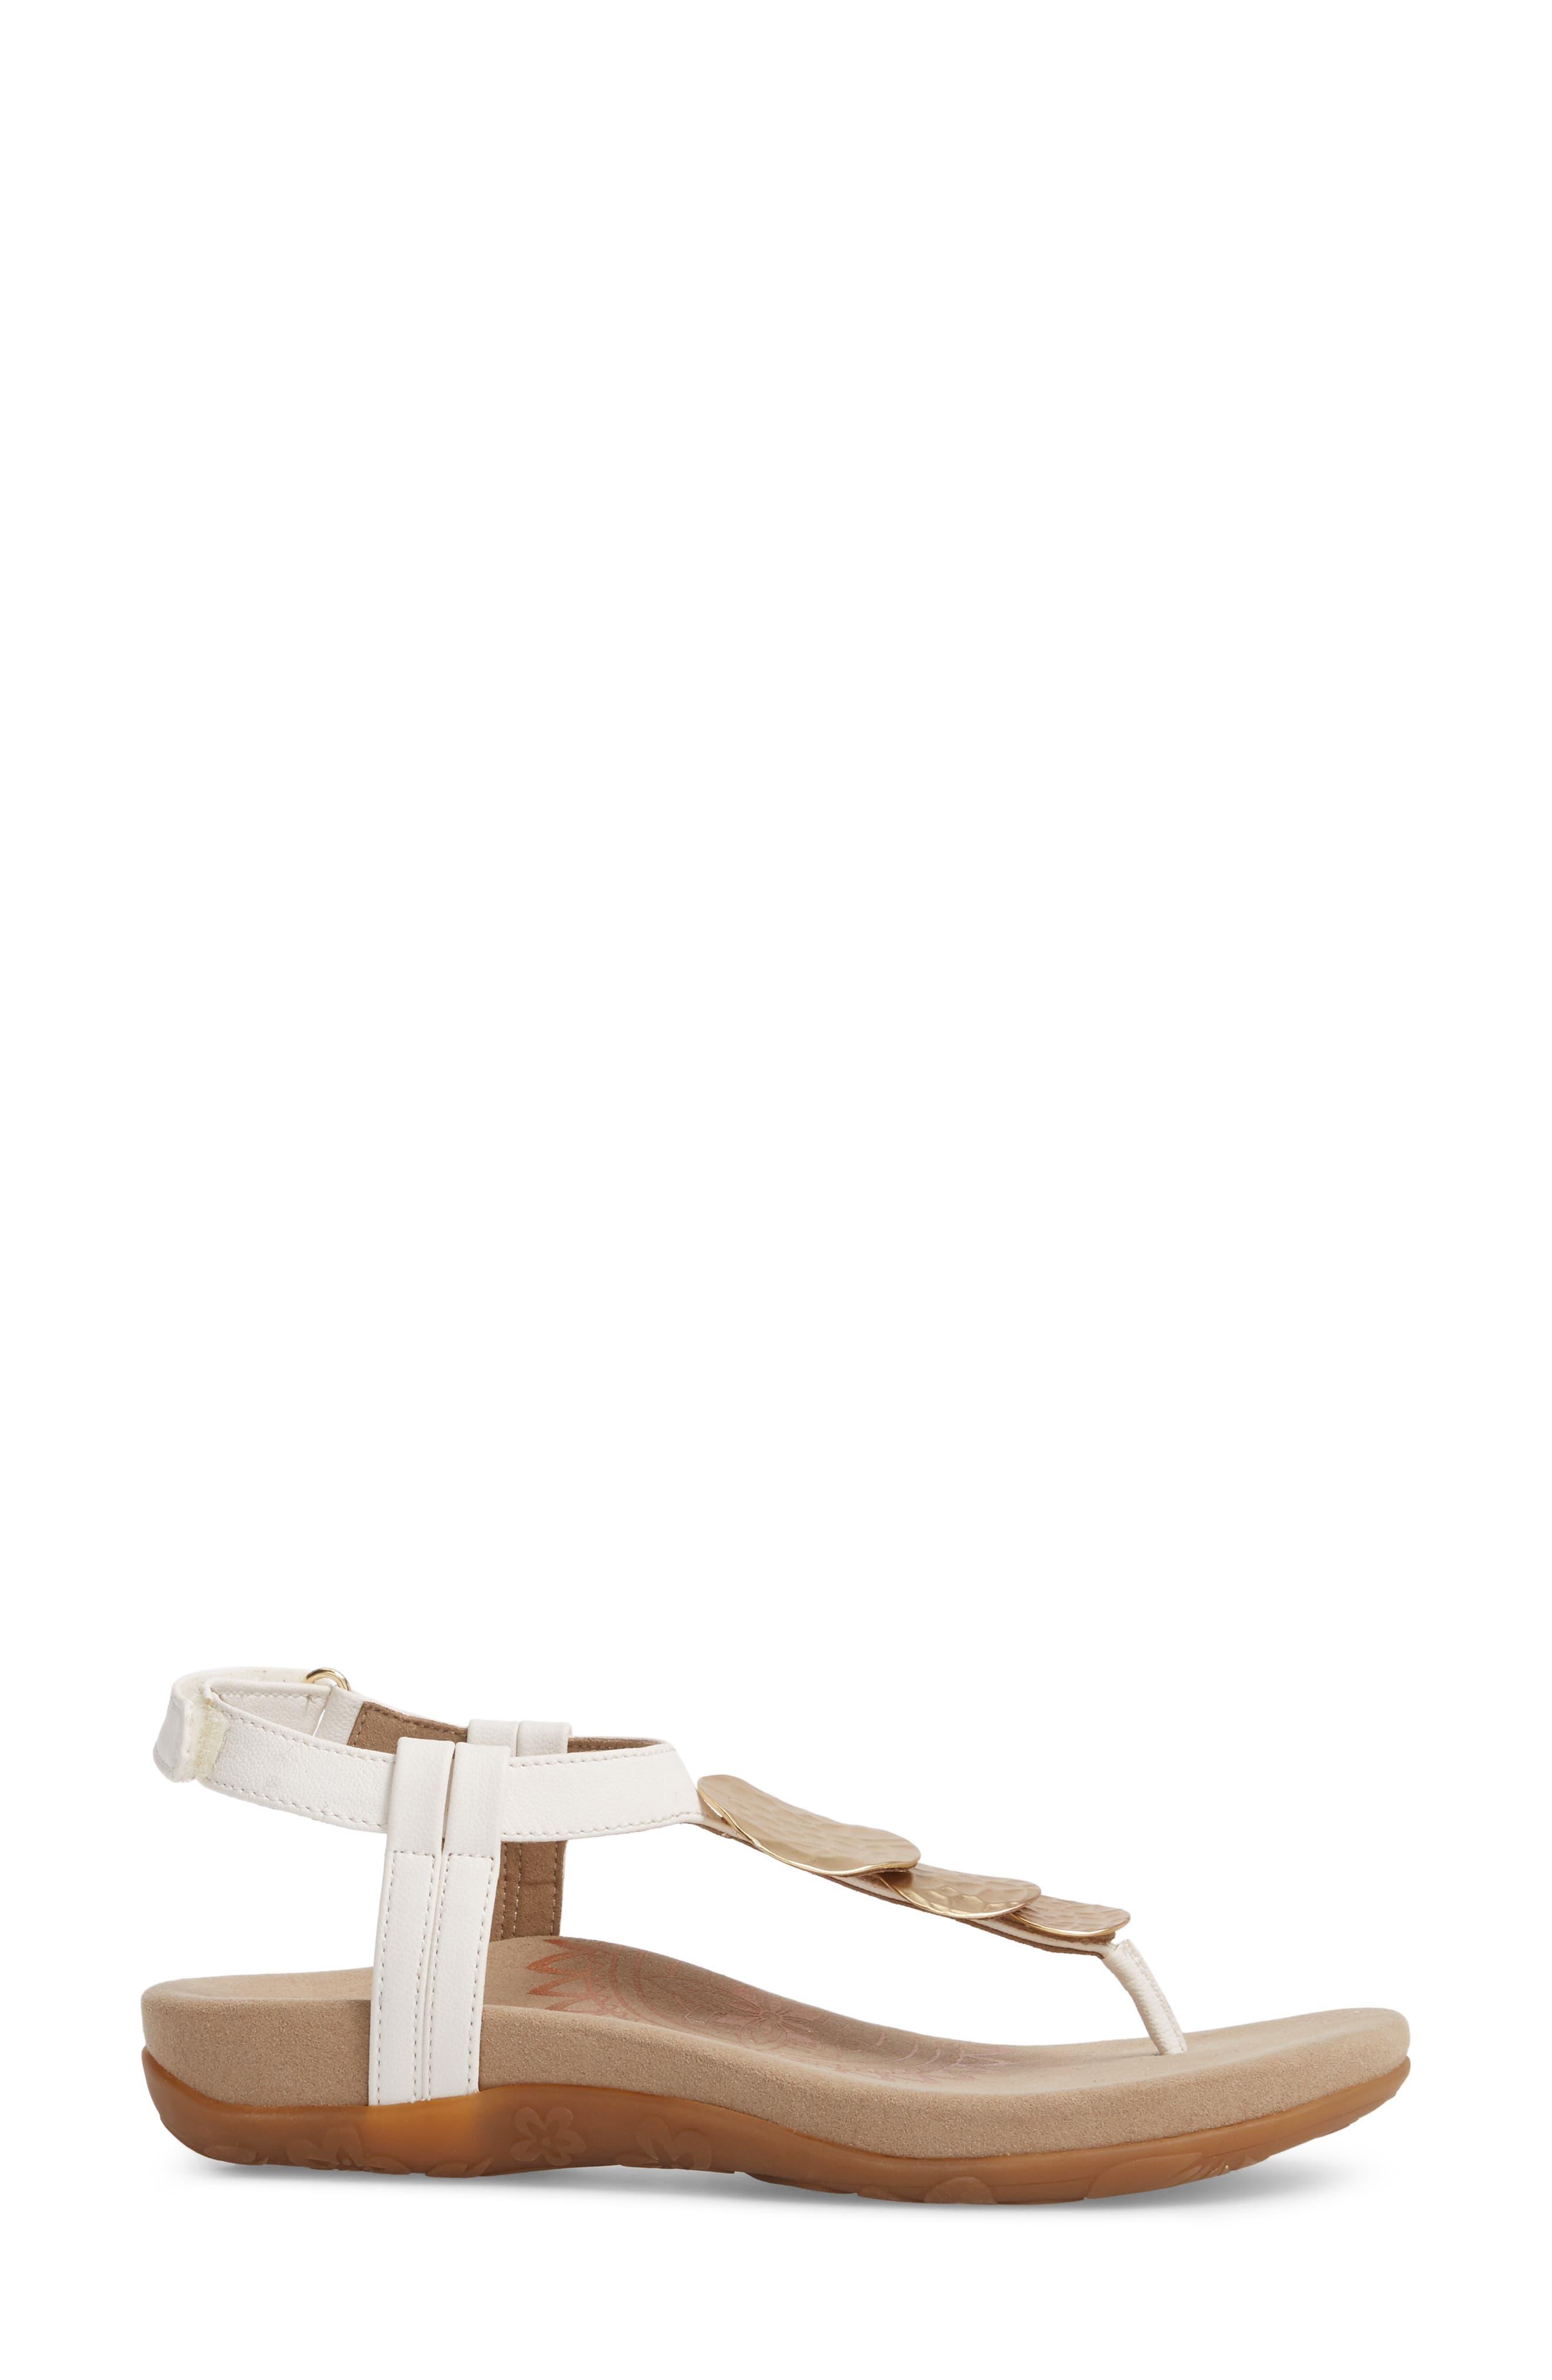 Olive T-Strap Sandal,                             Alternate thumbnail 8, color,